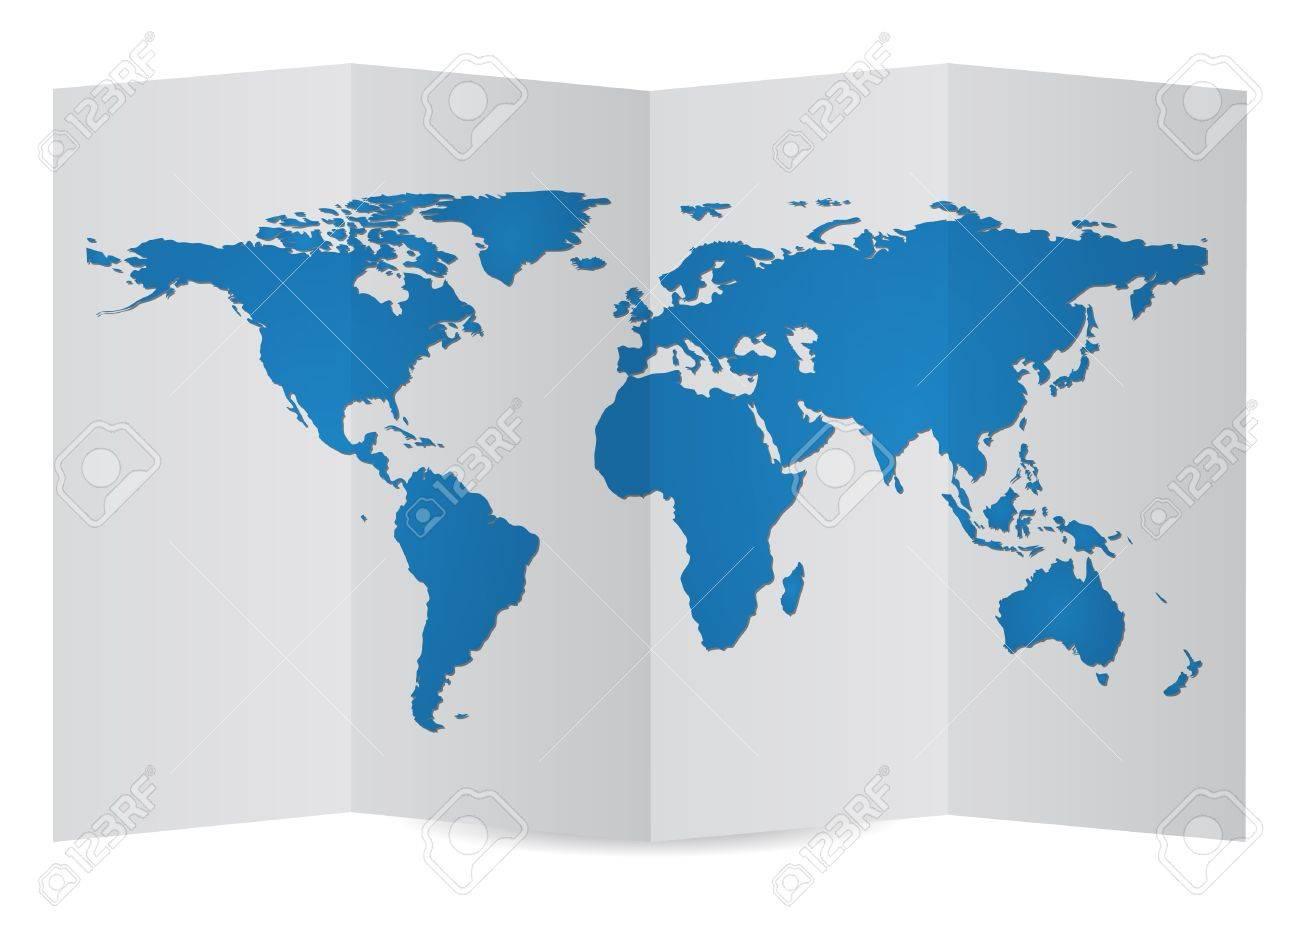 World map globe on paper carpeta ilustracin vectorial eps 10 foto de archivo world map globe on paper carpeta ilustracin vectorial eps 10 gumiabroncs Image collections